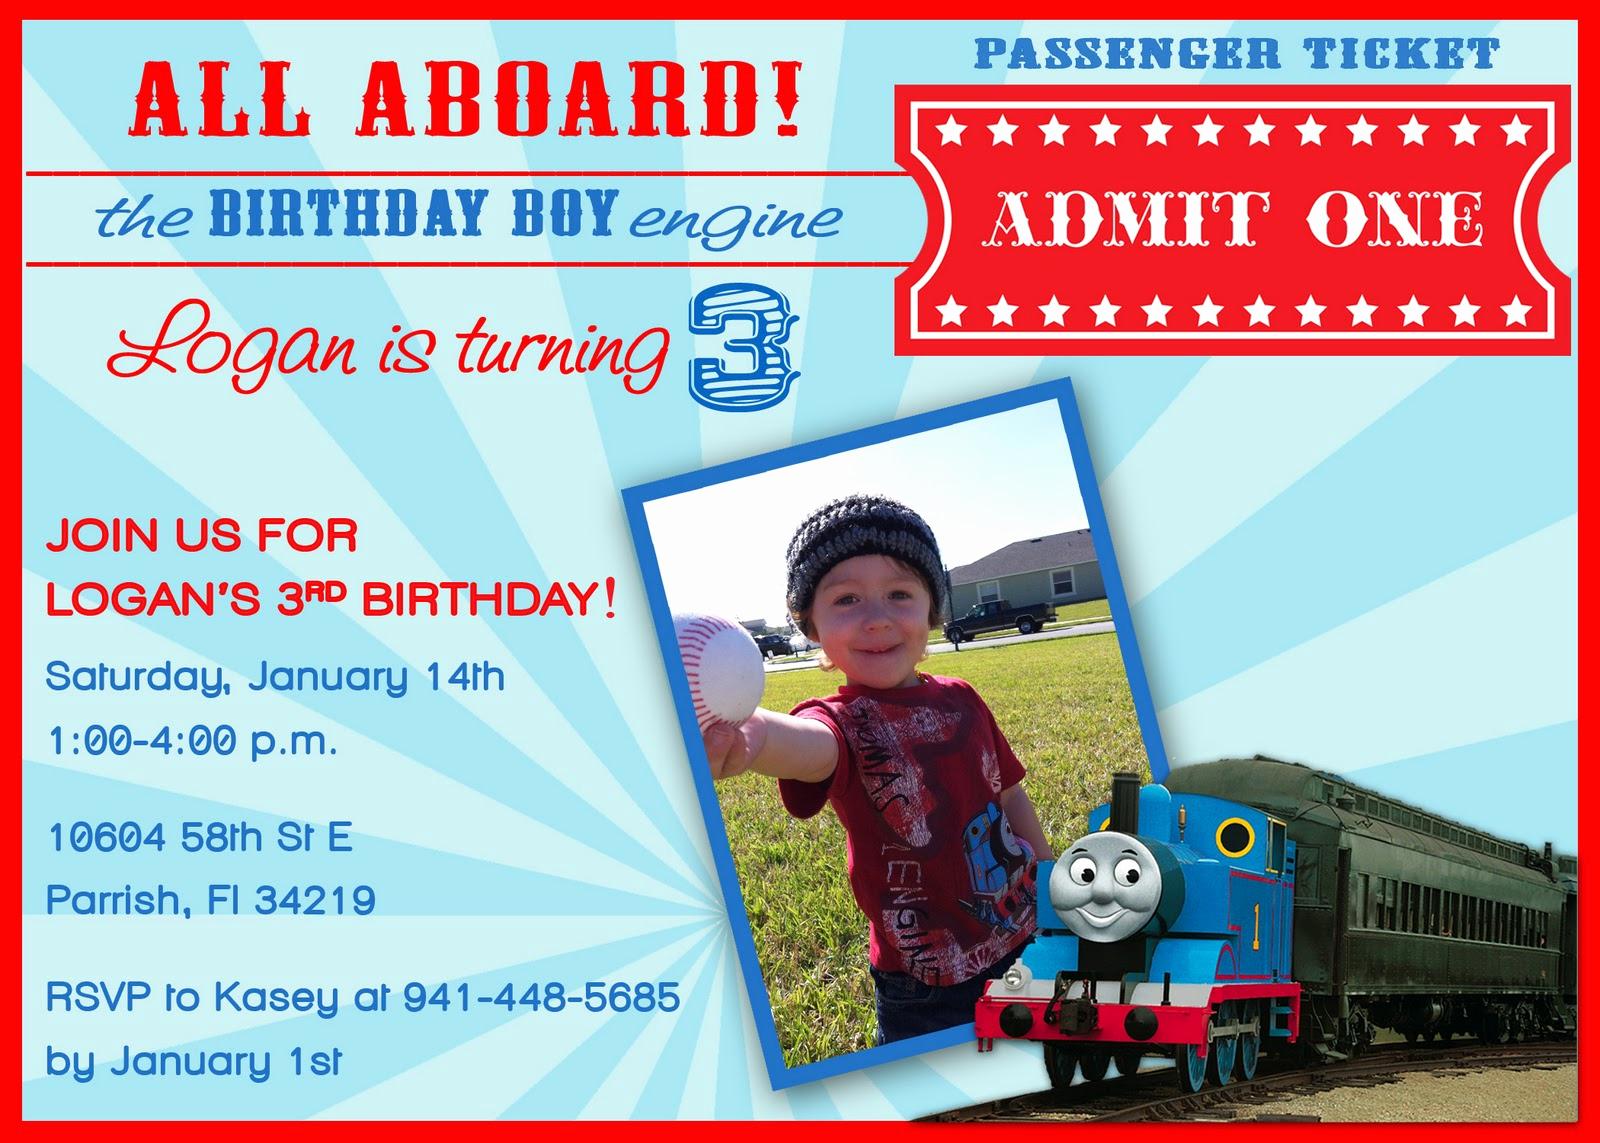 Thomas the Train Invitation Template Elegant 40th Birthday Ideas Free Thomas and Friends Birthday